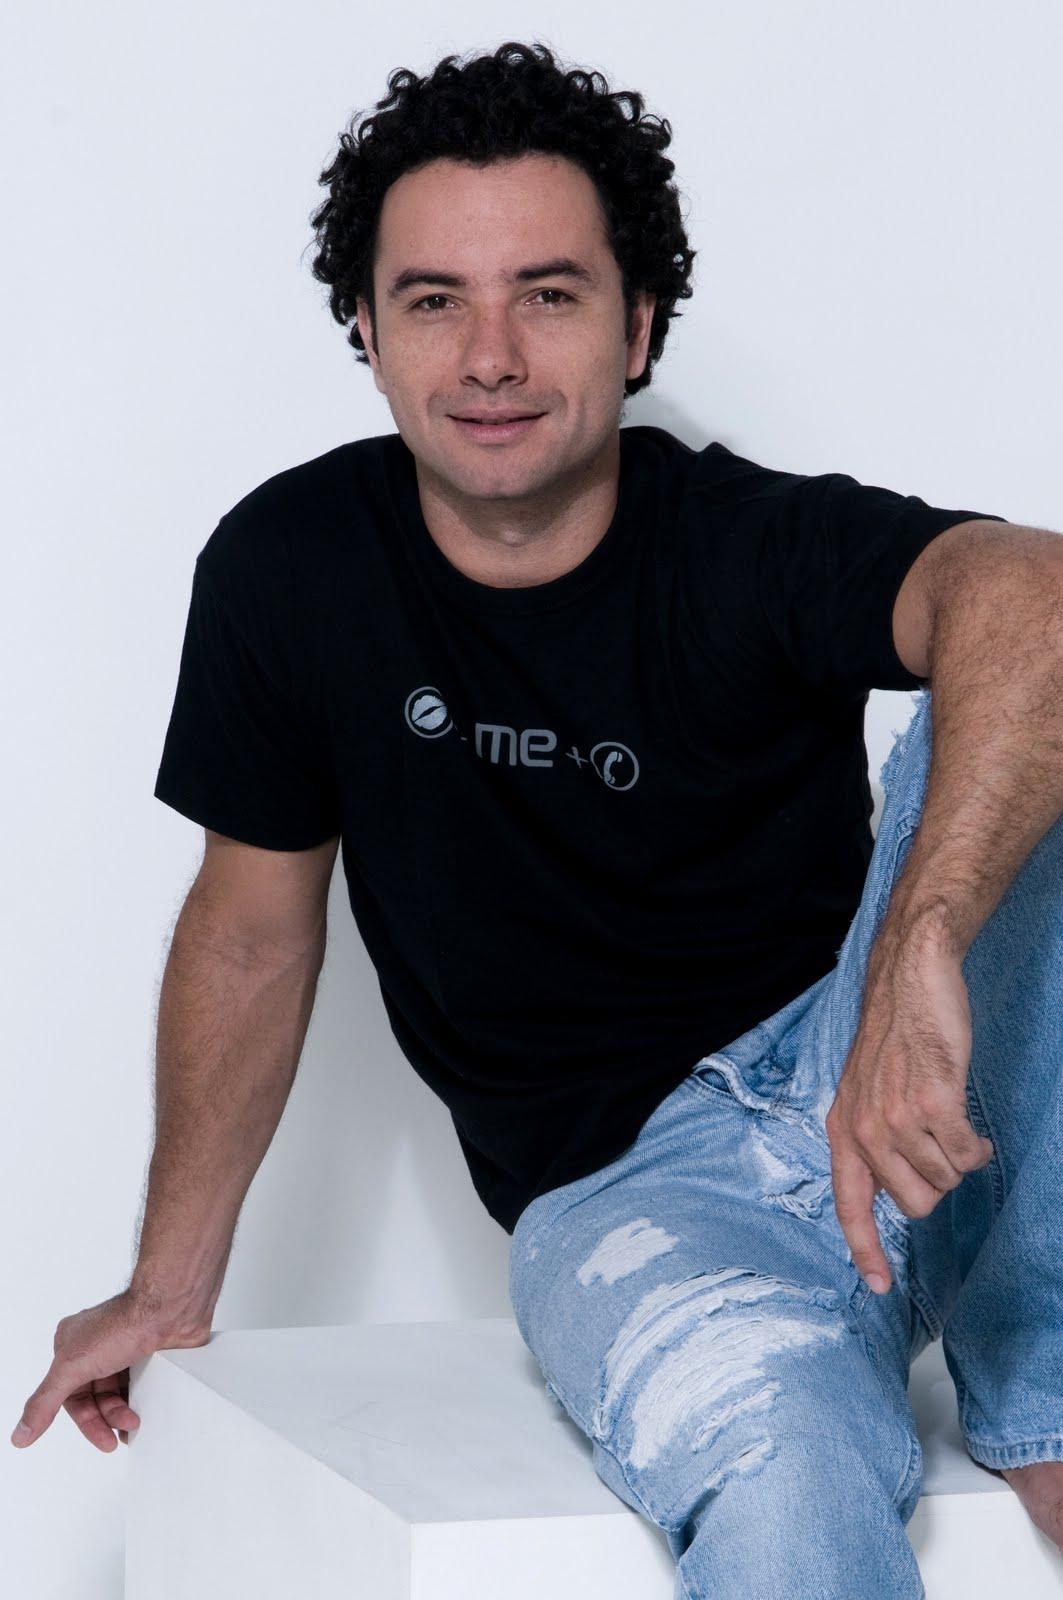 http://2.bp.blogspot.com/_lLuZPzhtQSc/TDXeQyxjITI/AAAAAAAAANQ/0Cuyf2cVf8U/s1600/foto+Marco+luque+-+Paulo+Reis.JPG